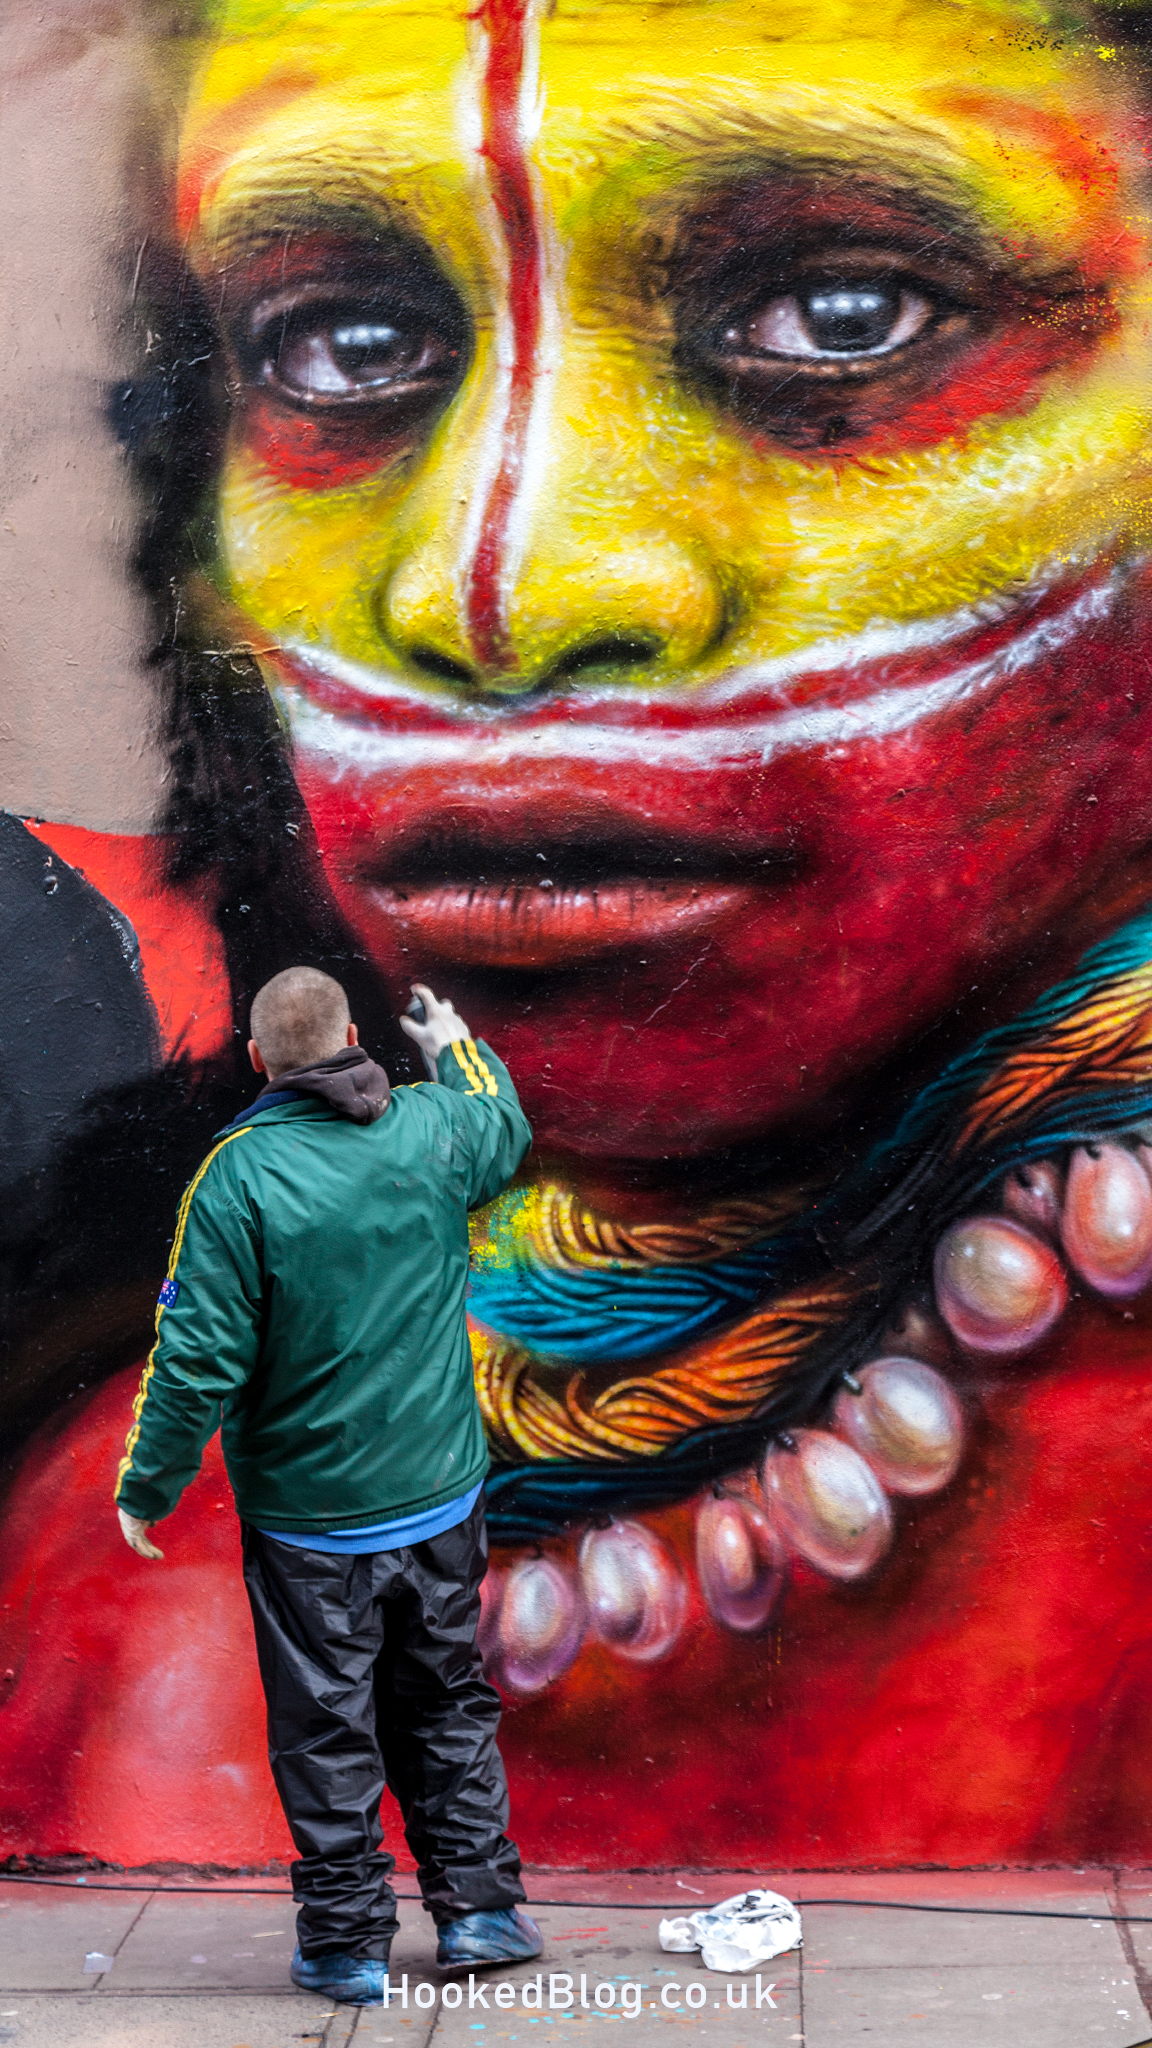 Magnificent Mural on Hanbury Street, London by street artist Dale Grimshaw. #streetart #mural #Hookedblog